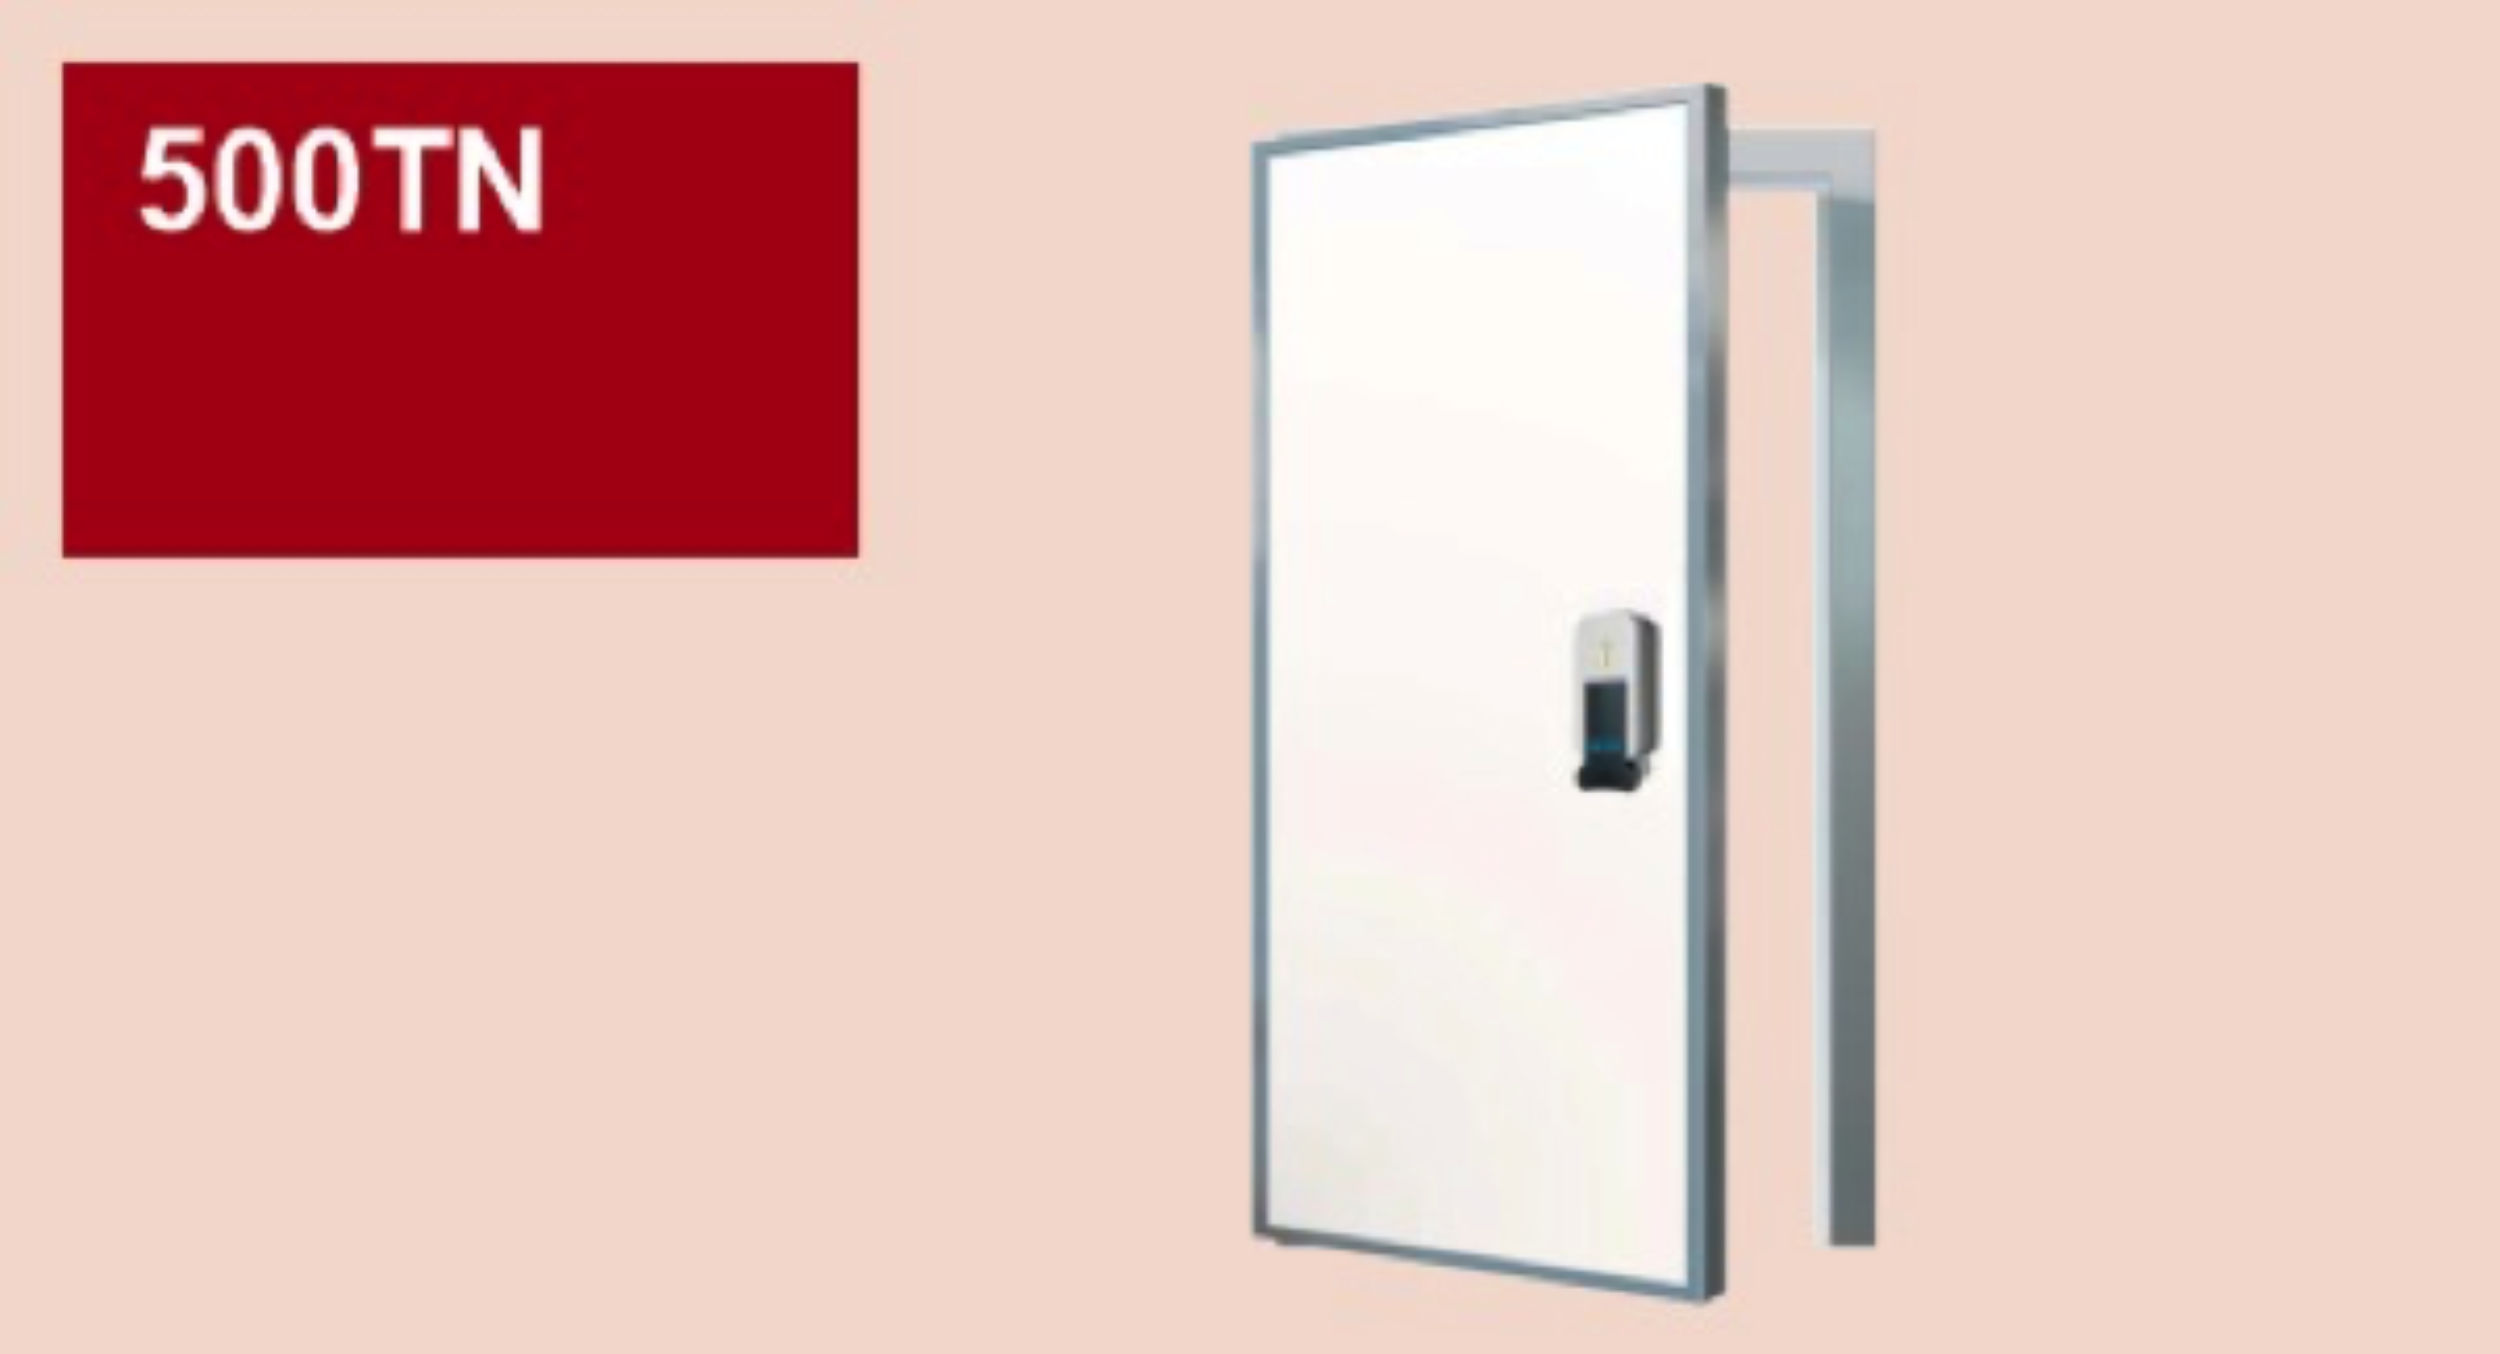 Main_MTCSS_MTH_Hinged_Door_500TN